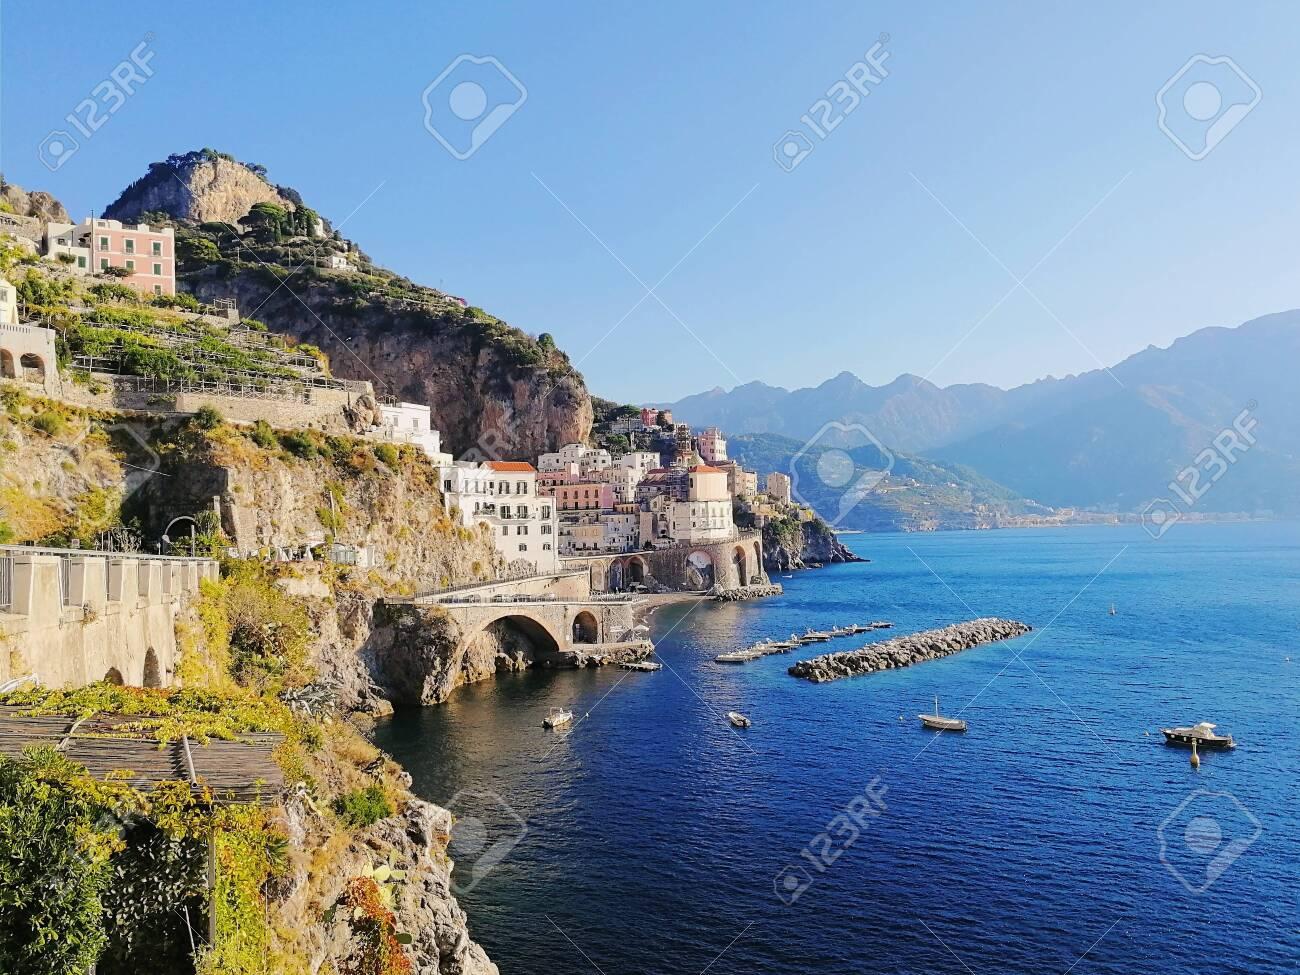 Atrani Italy Amalfi Coast View Of The City Beach And Mountains